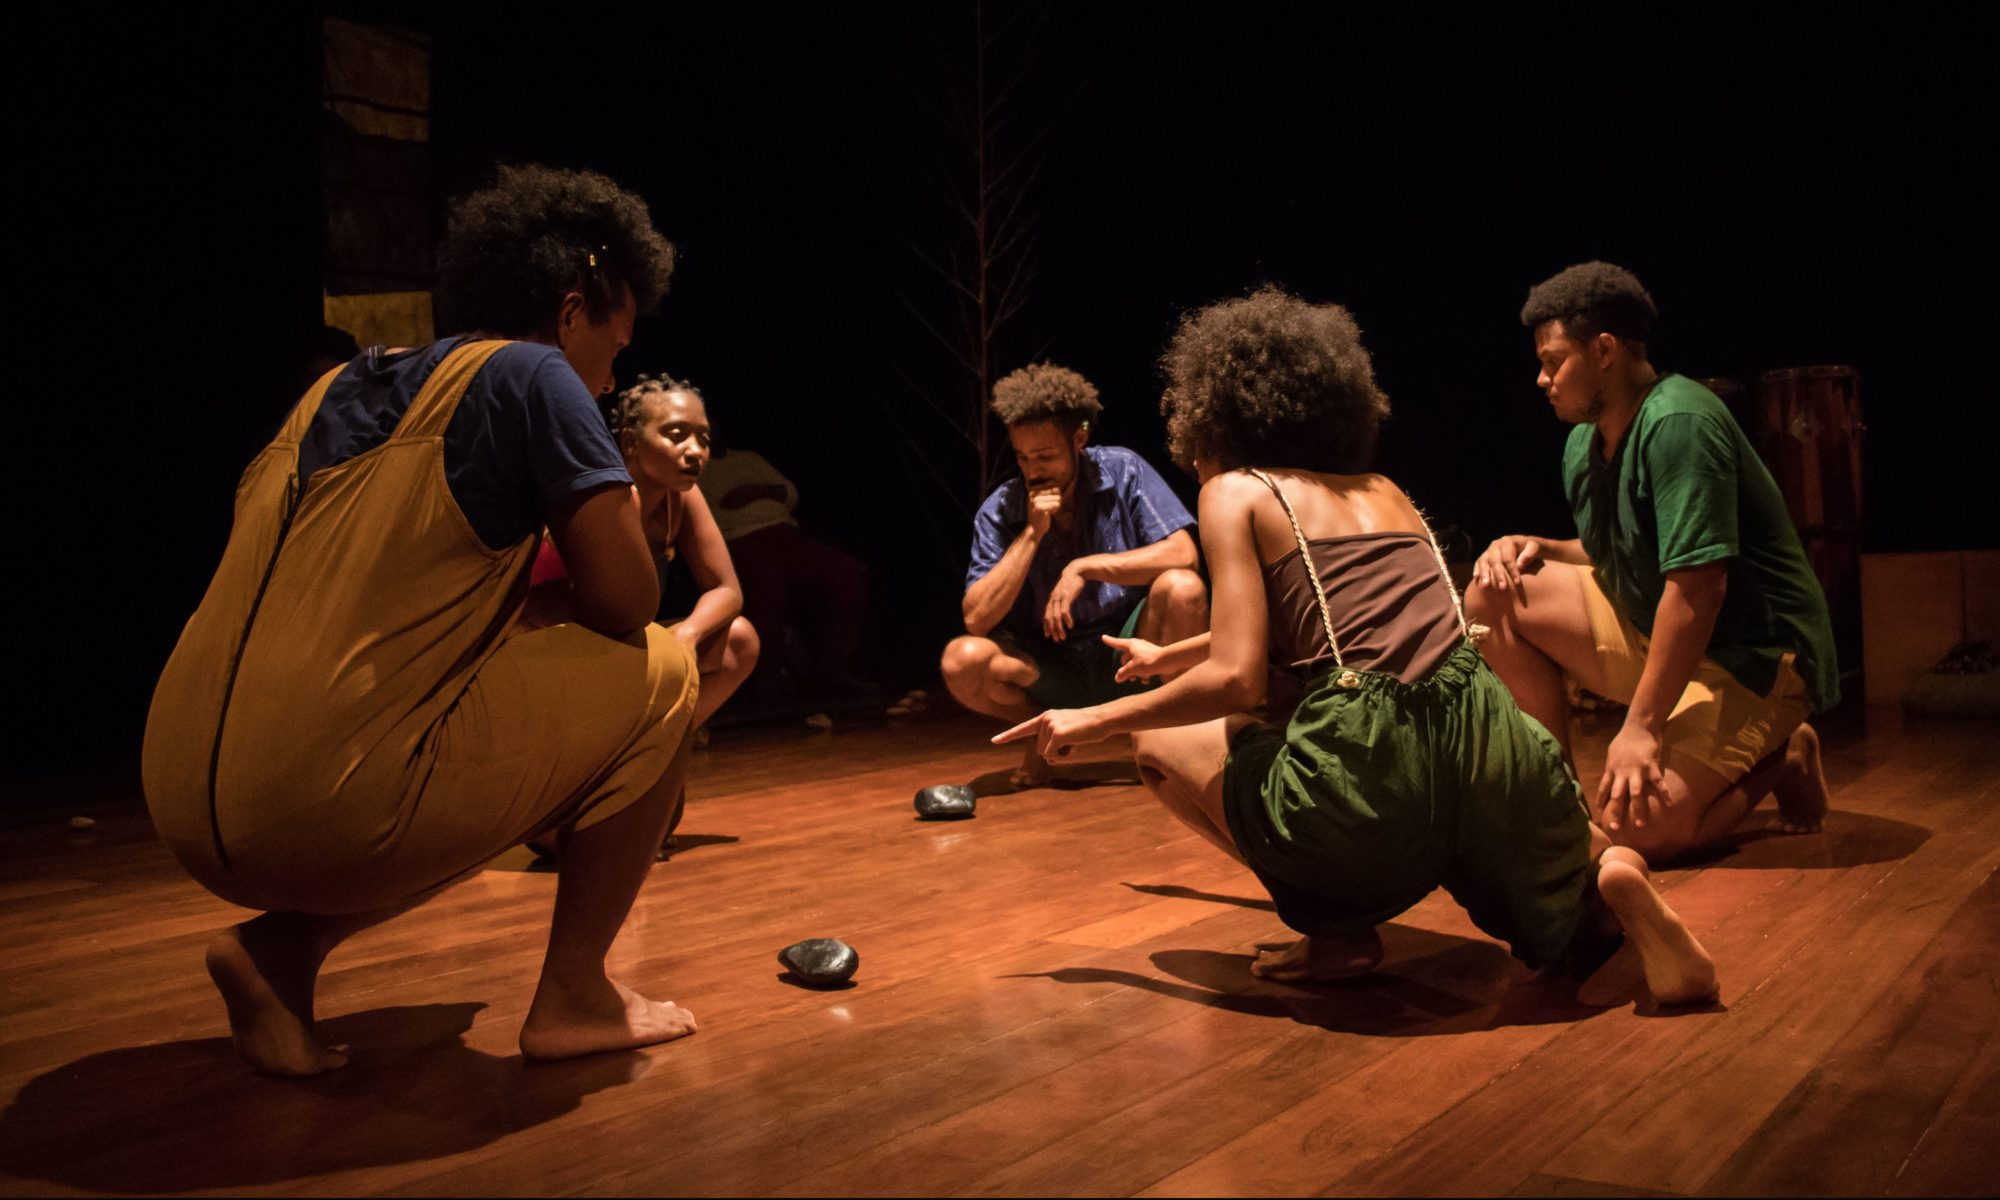 Segunda PRETA: Dedicated to giving visibility to black in Belo Horizonte